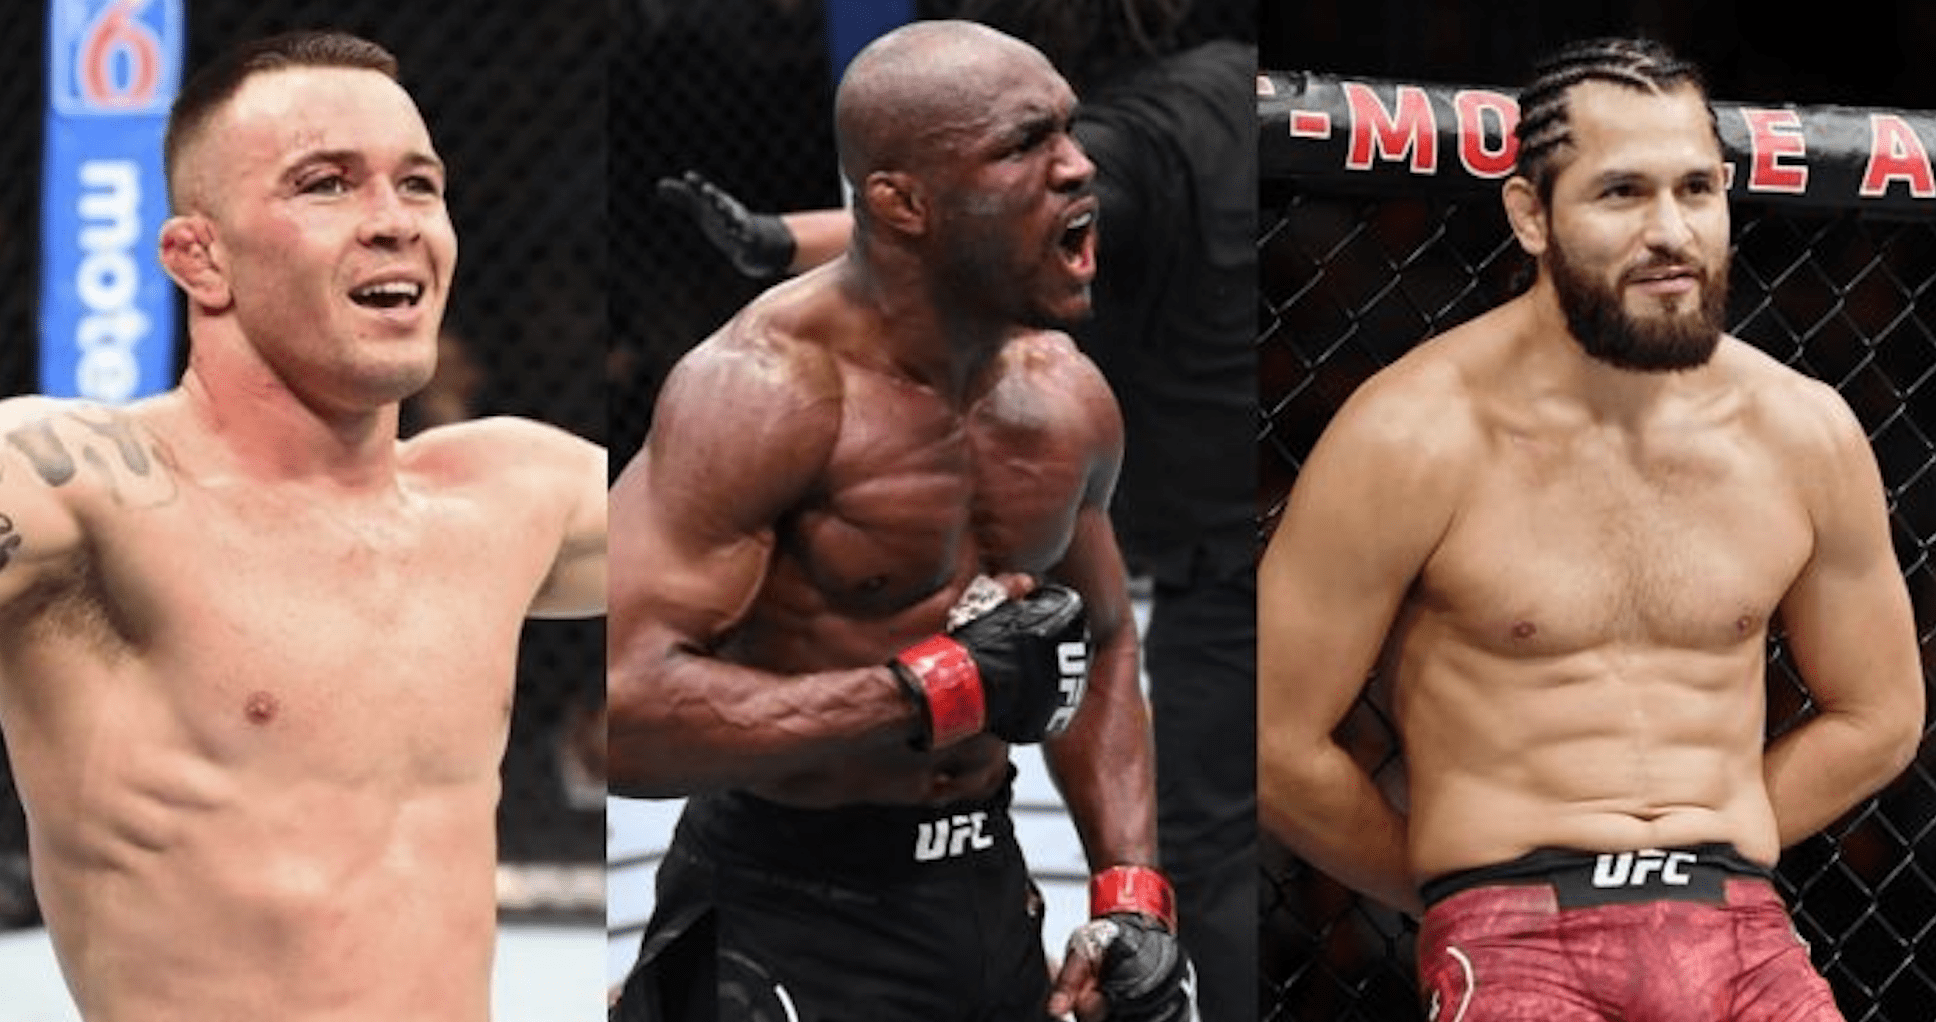 UFC: Colby Covington Slams Kamaru Usman And Jorge Masvidal